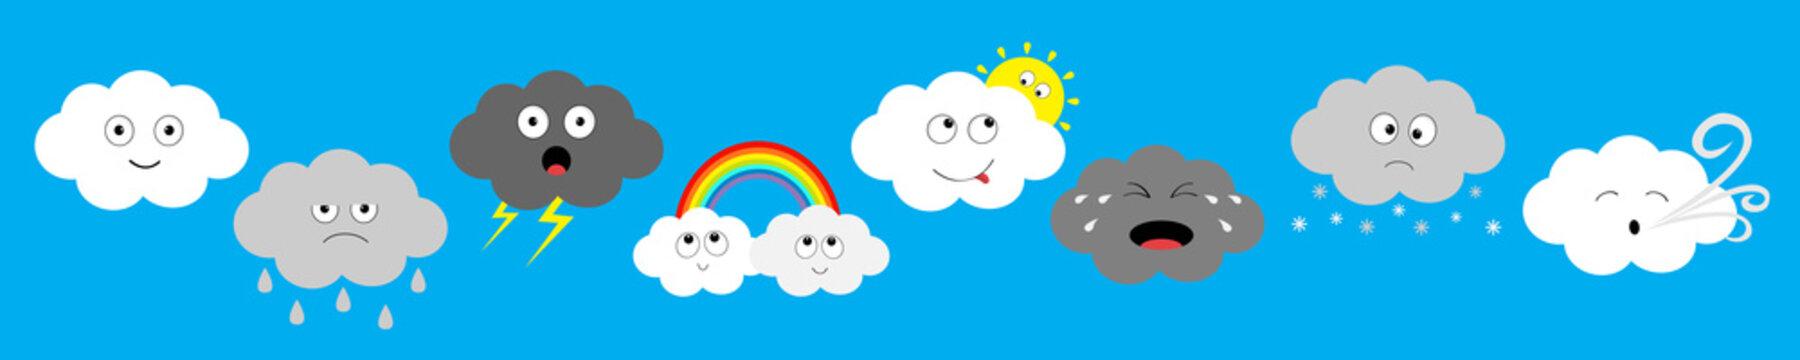 White dark cloud emoji emotion icon set line. Fluffy clouds. Sun, rainbow, rain drop, wind, thunderbolt storm lightning. Cute cartoon kawaii cloudscape Flat design Blues sky background Isolated